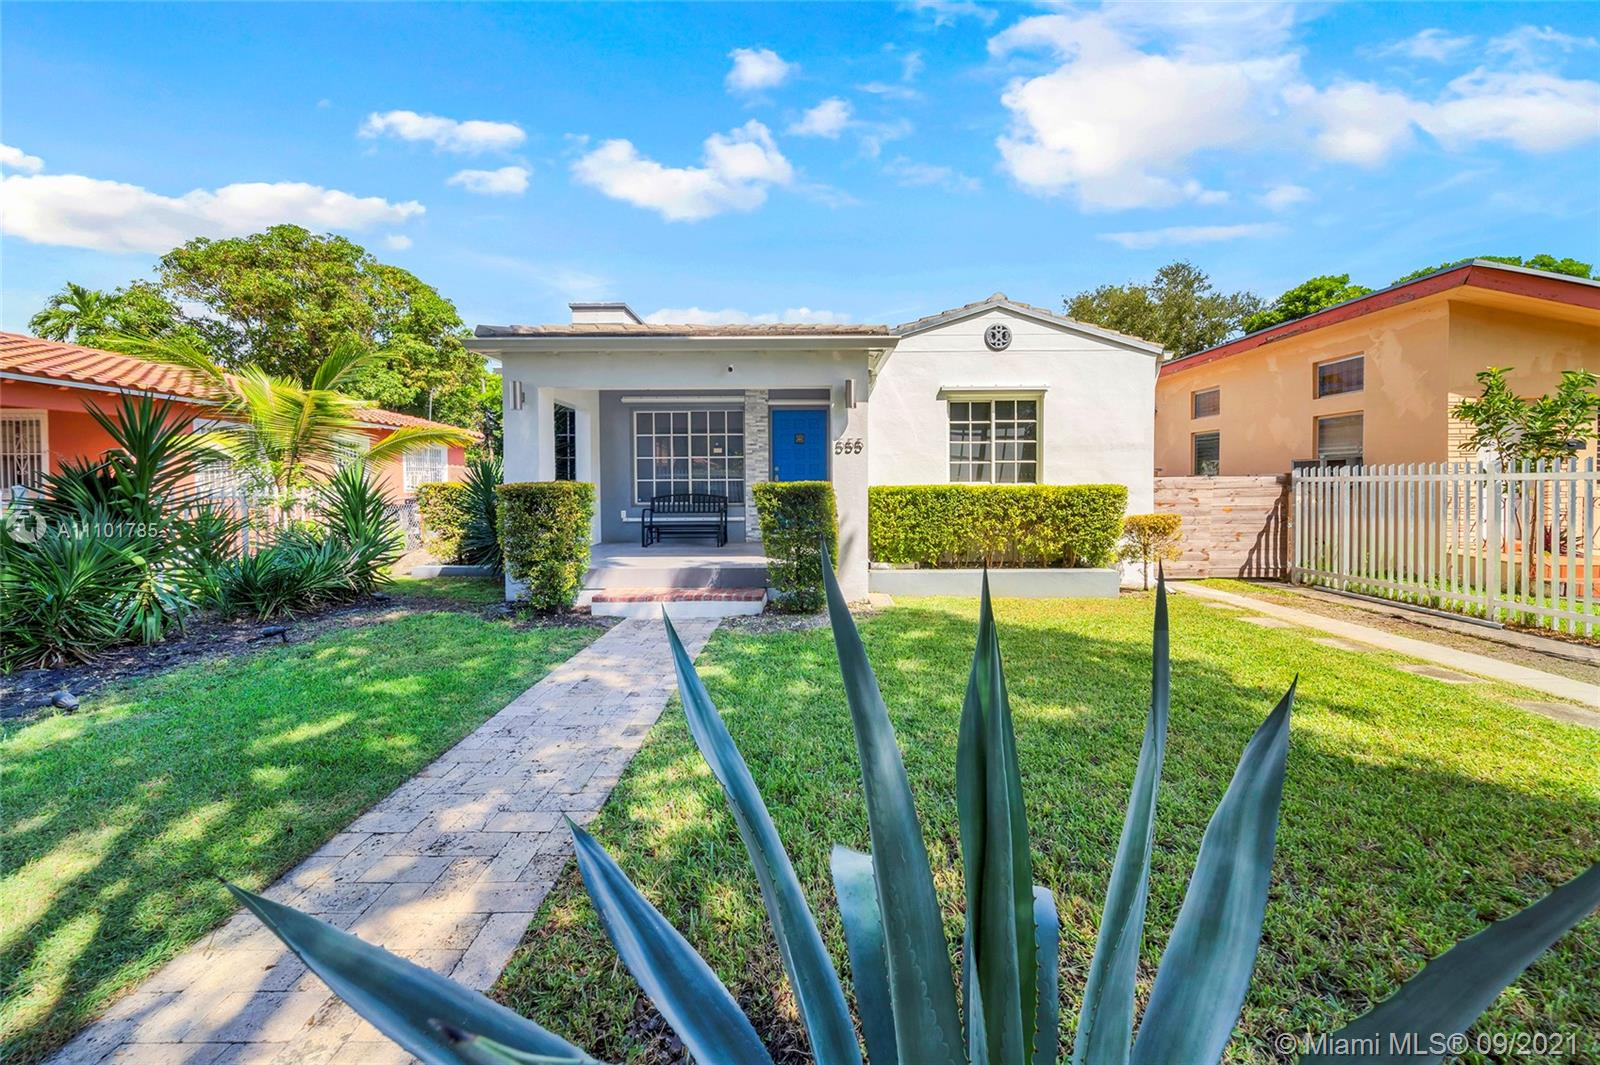 Single Family Home,For Sale,555 NE 73rd St, Miami, Florida 33138,Brickell,realty,broker,condos near me